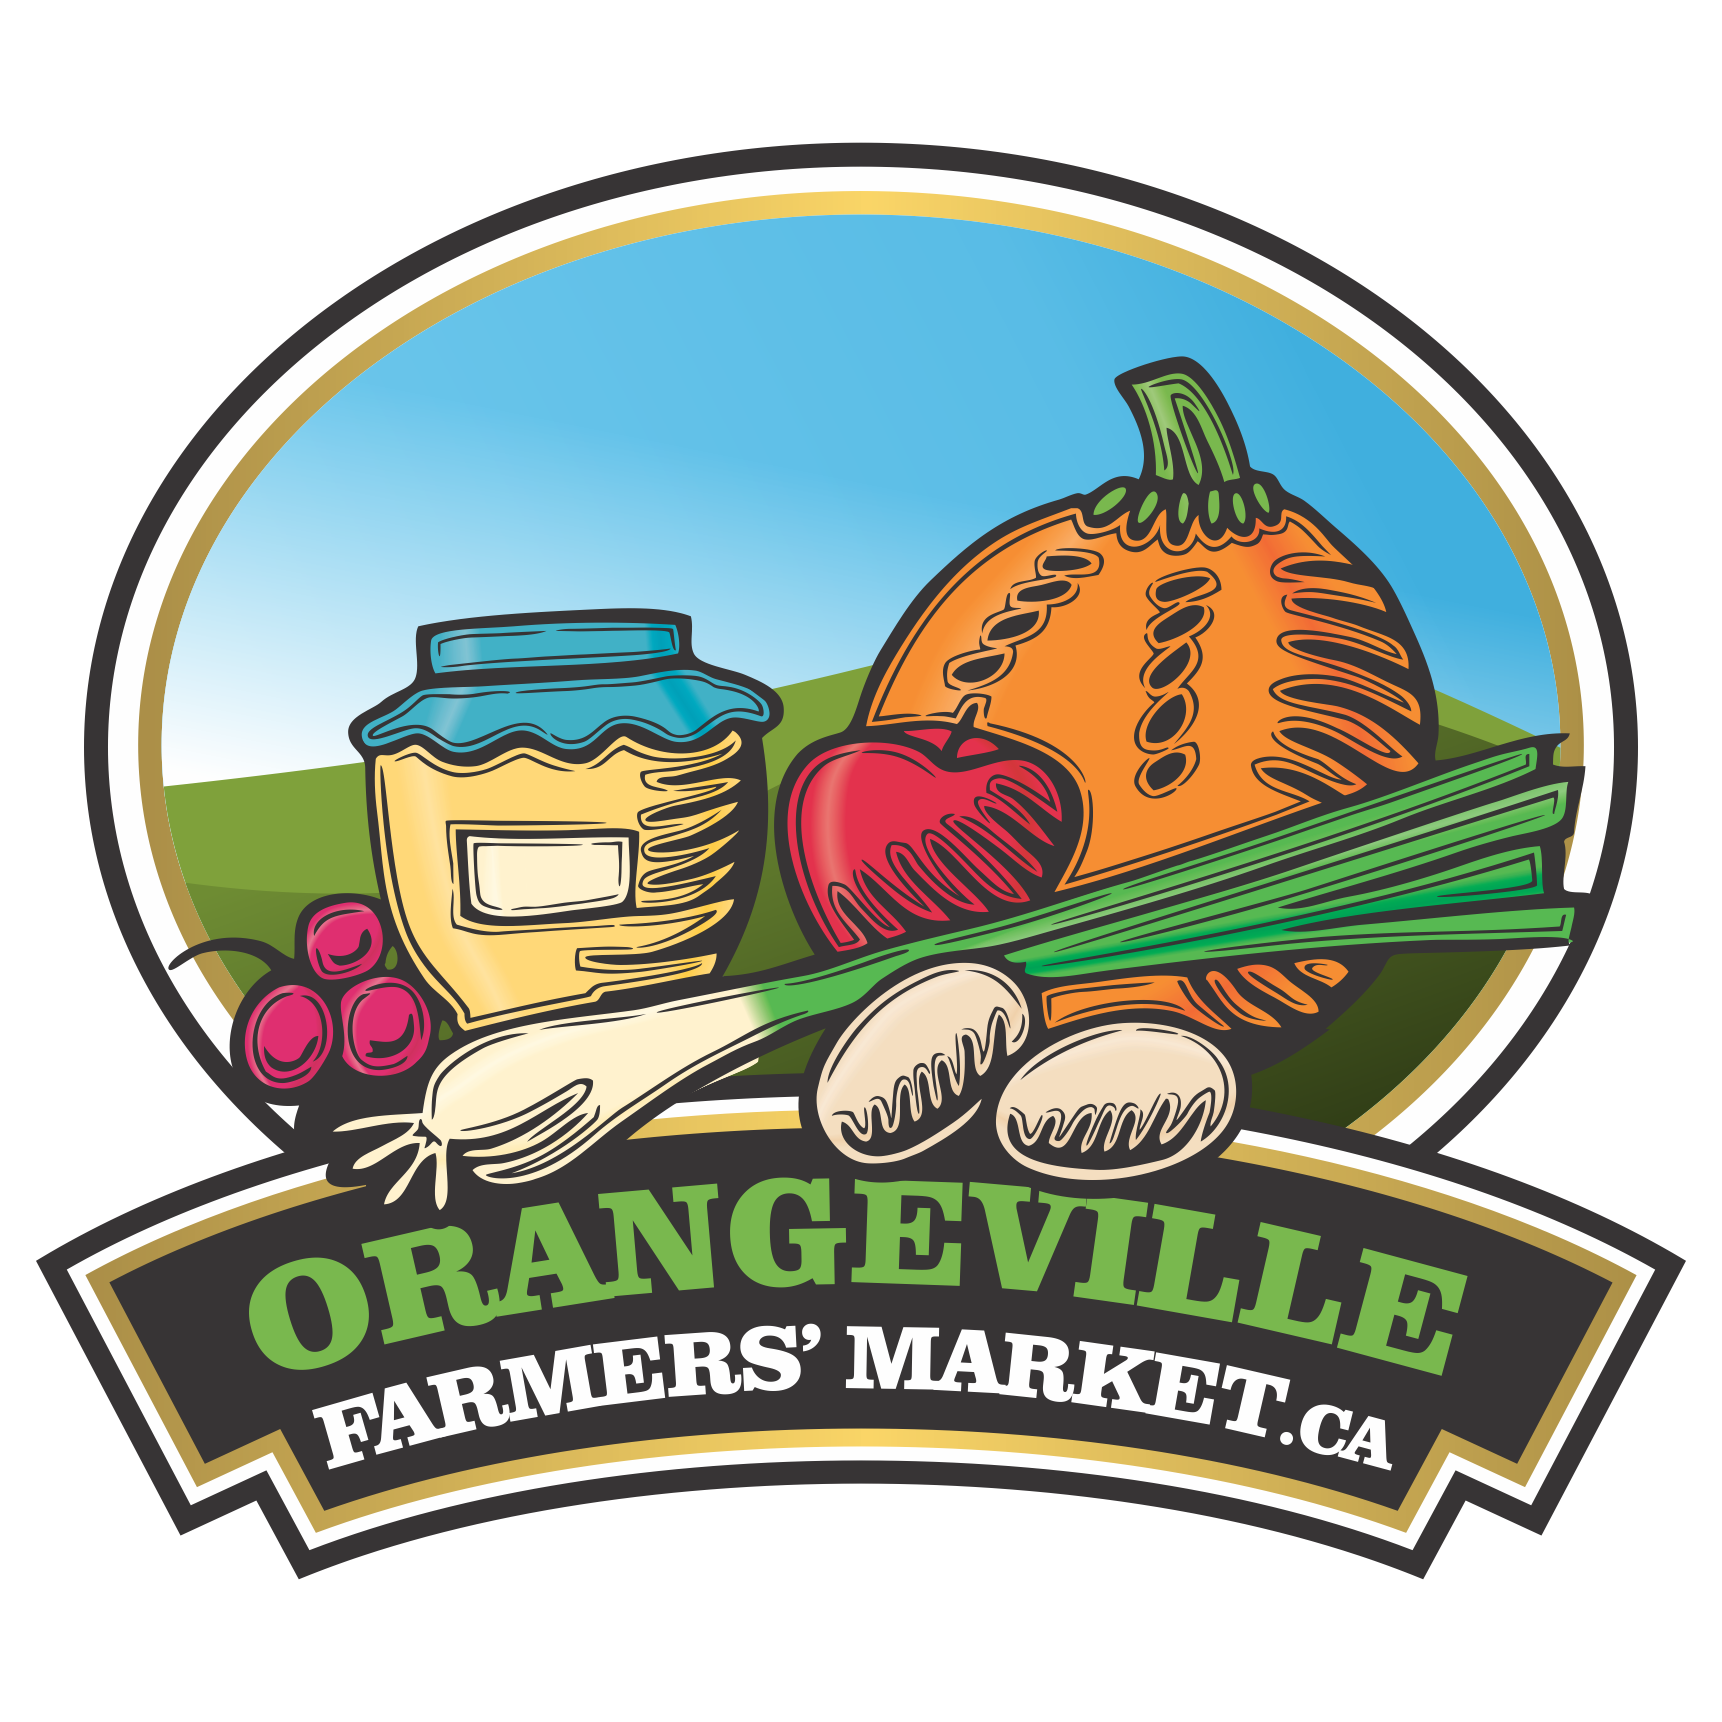 Farmers clipart farmers market. Orangeville headwaters more information